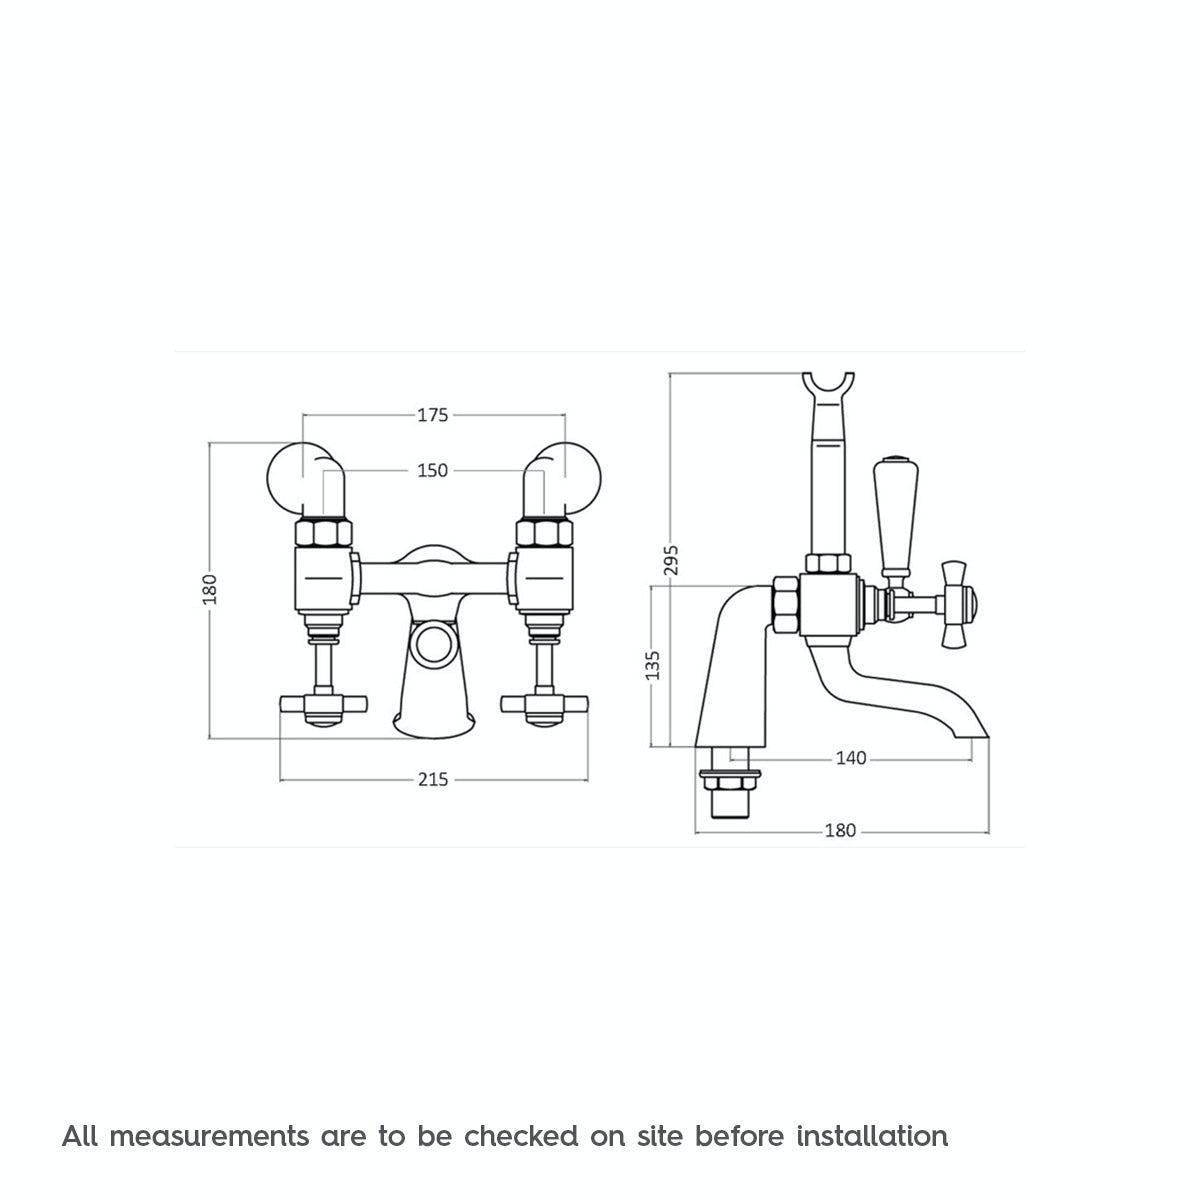 Dimensions for The Bath Co. Dulwich bath shower mixer tap